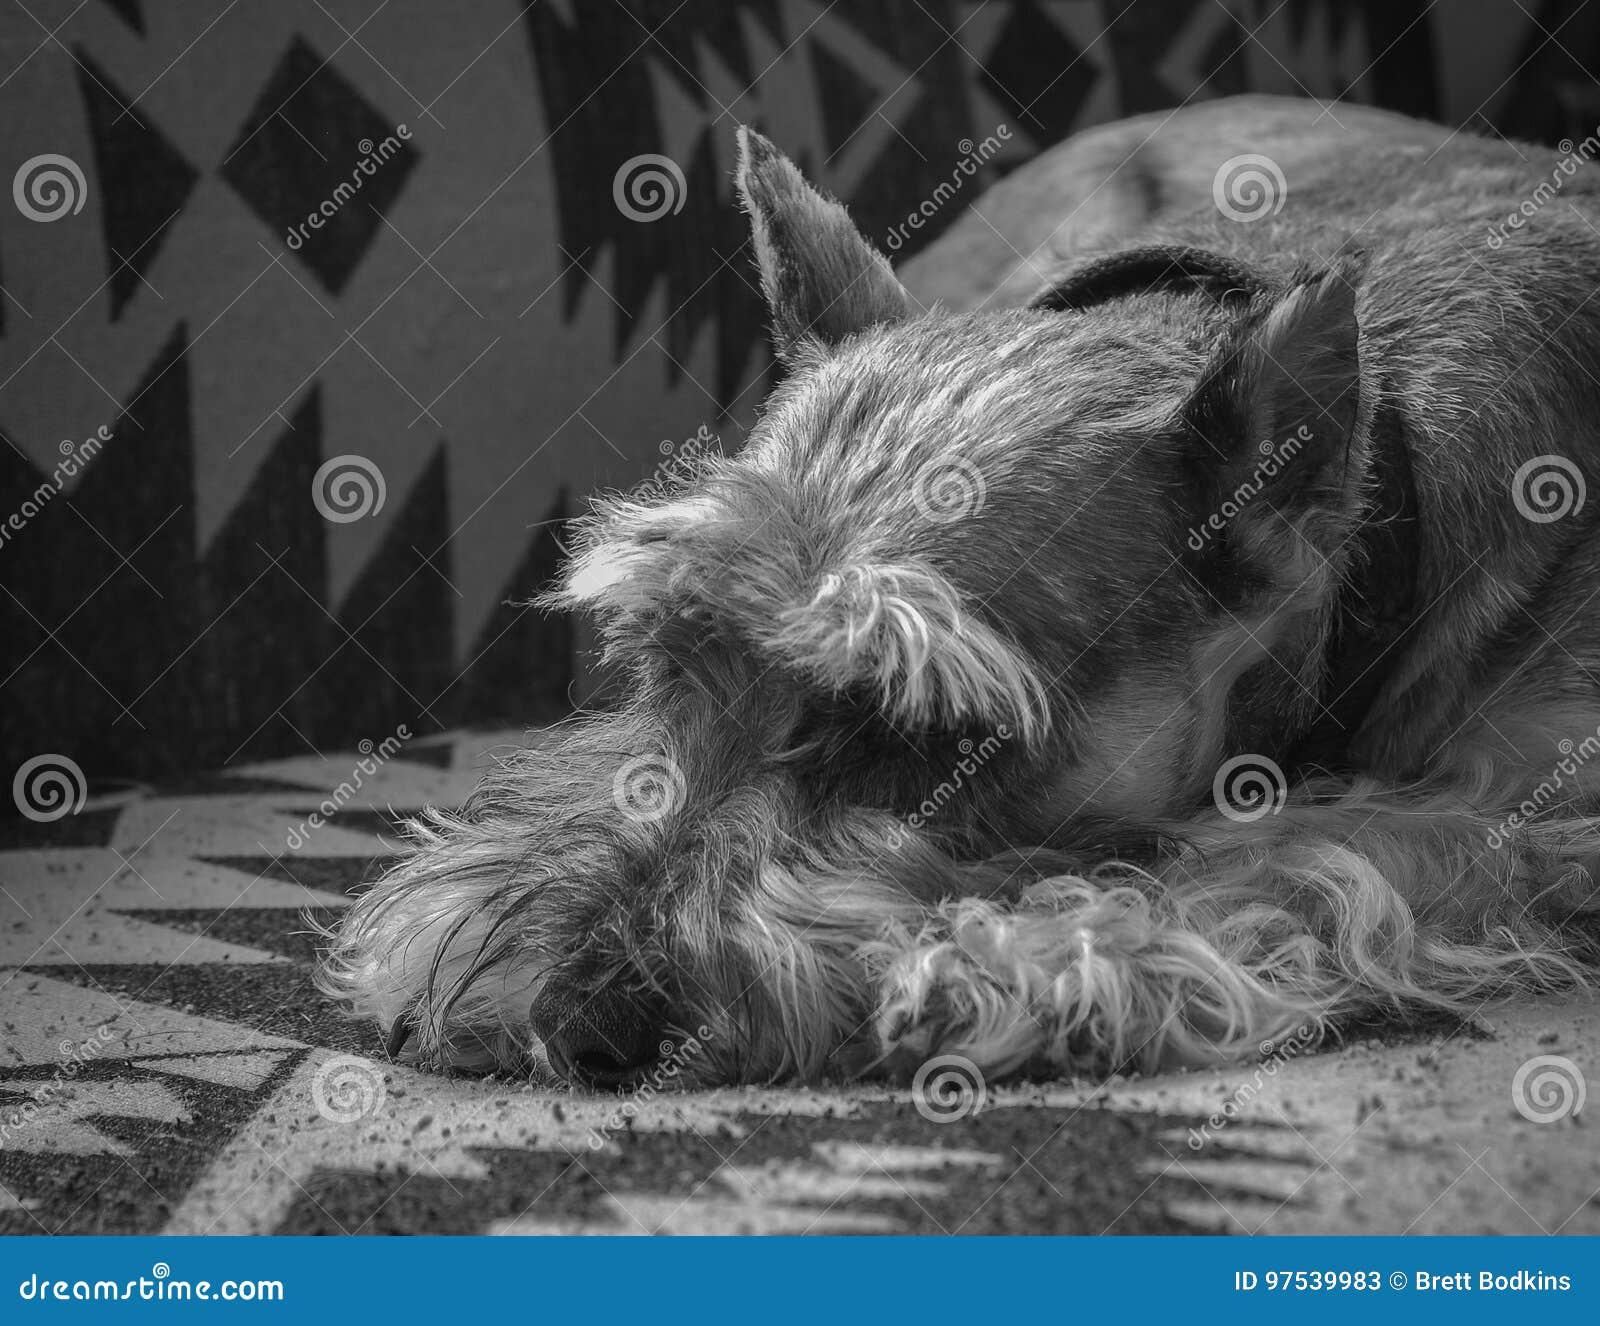 Schnauzer que descansa no sofá